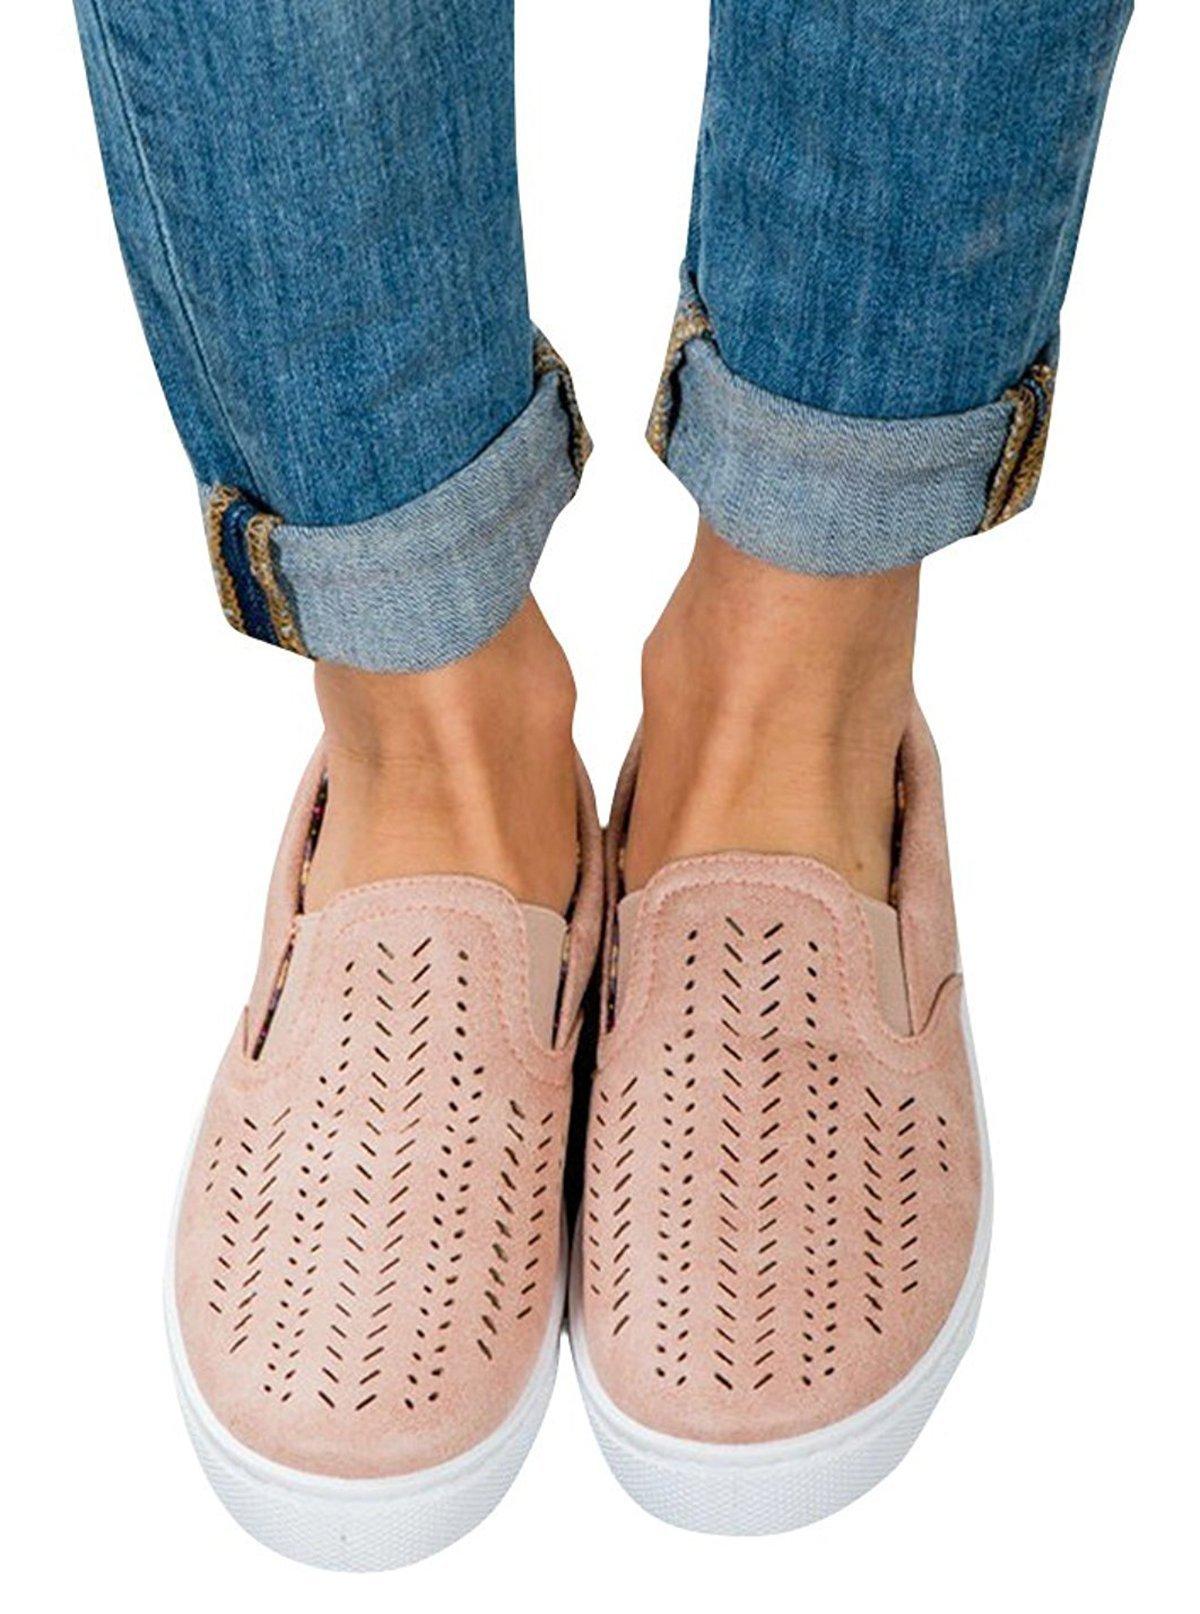 Paris Hill Women's Casual Hollow Loafer Canvas Flats Shoes, Lpink, Size 9.5